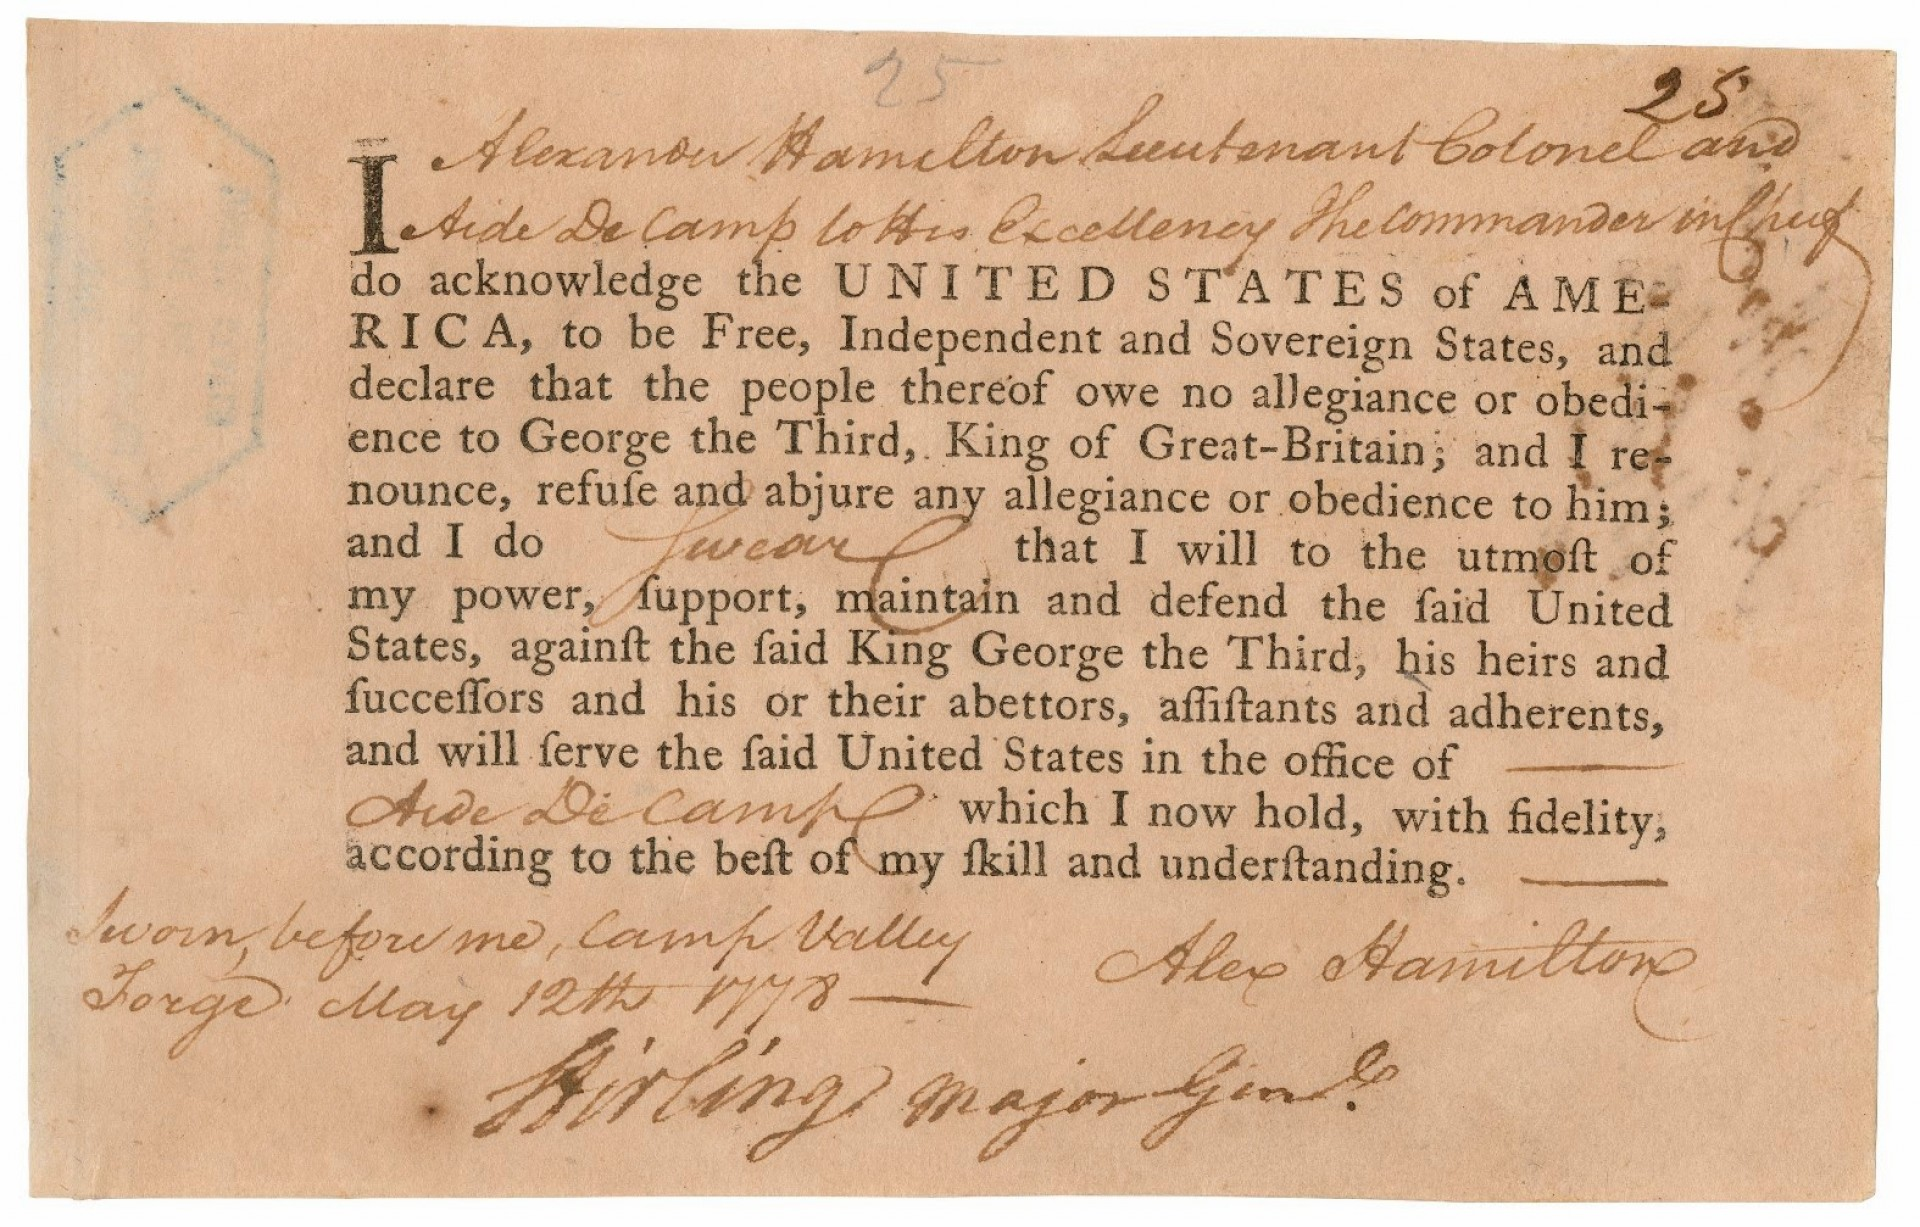 001 Alexanderhamiltonlarge Essay Example Alexander Hamilton Frightening Essays Federalist Papers Summary 51 1920